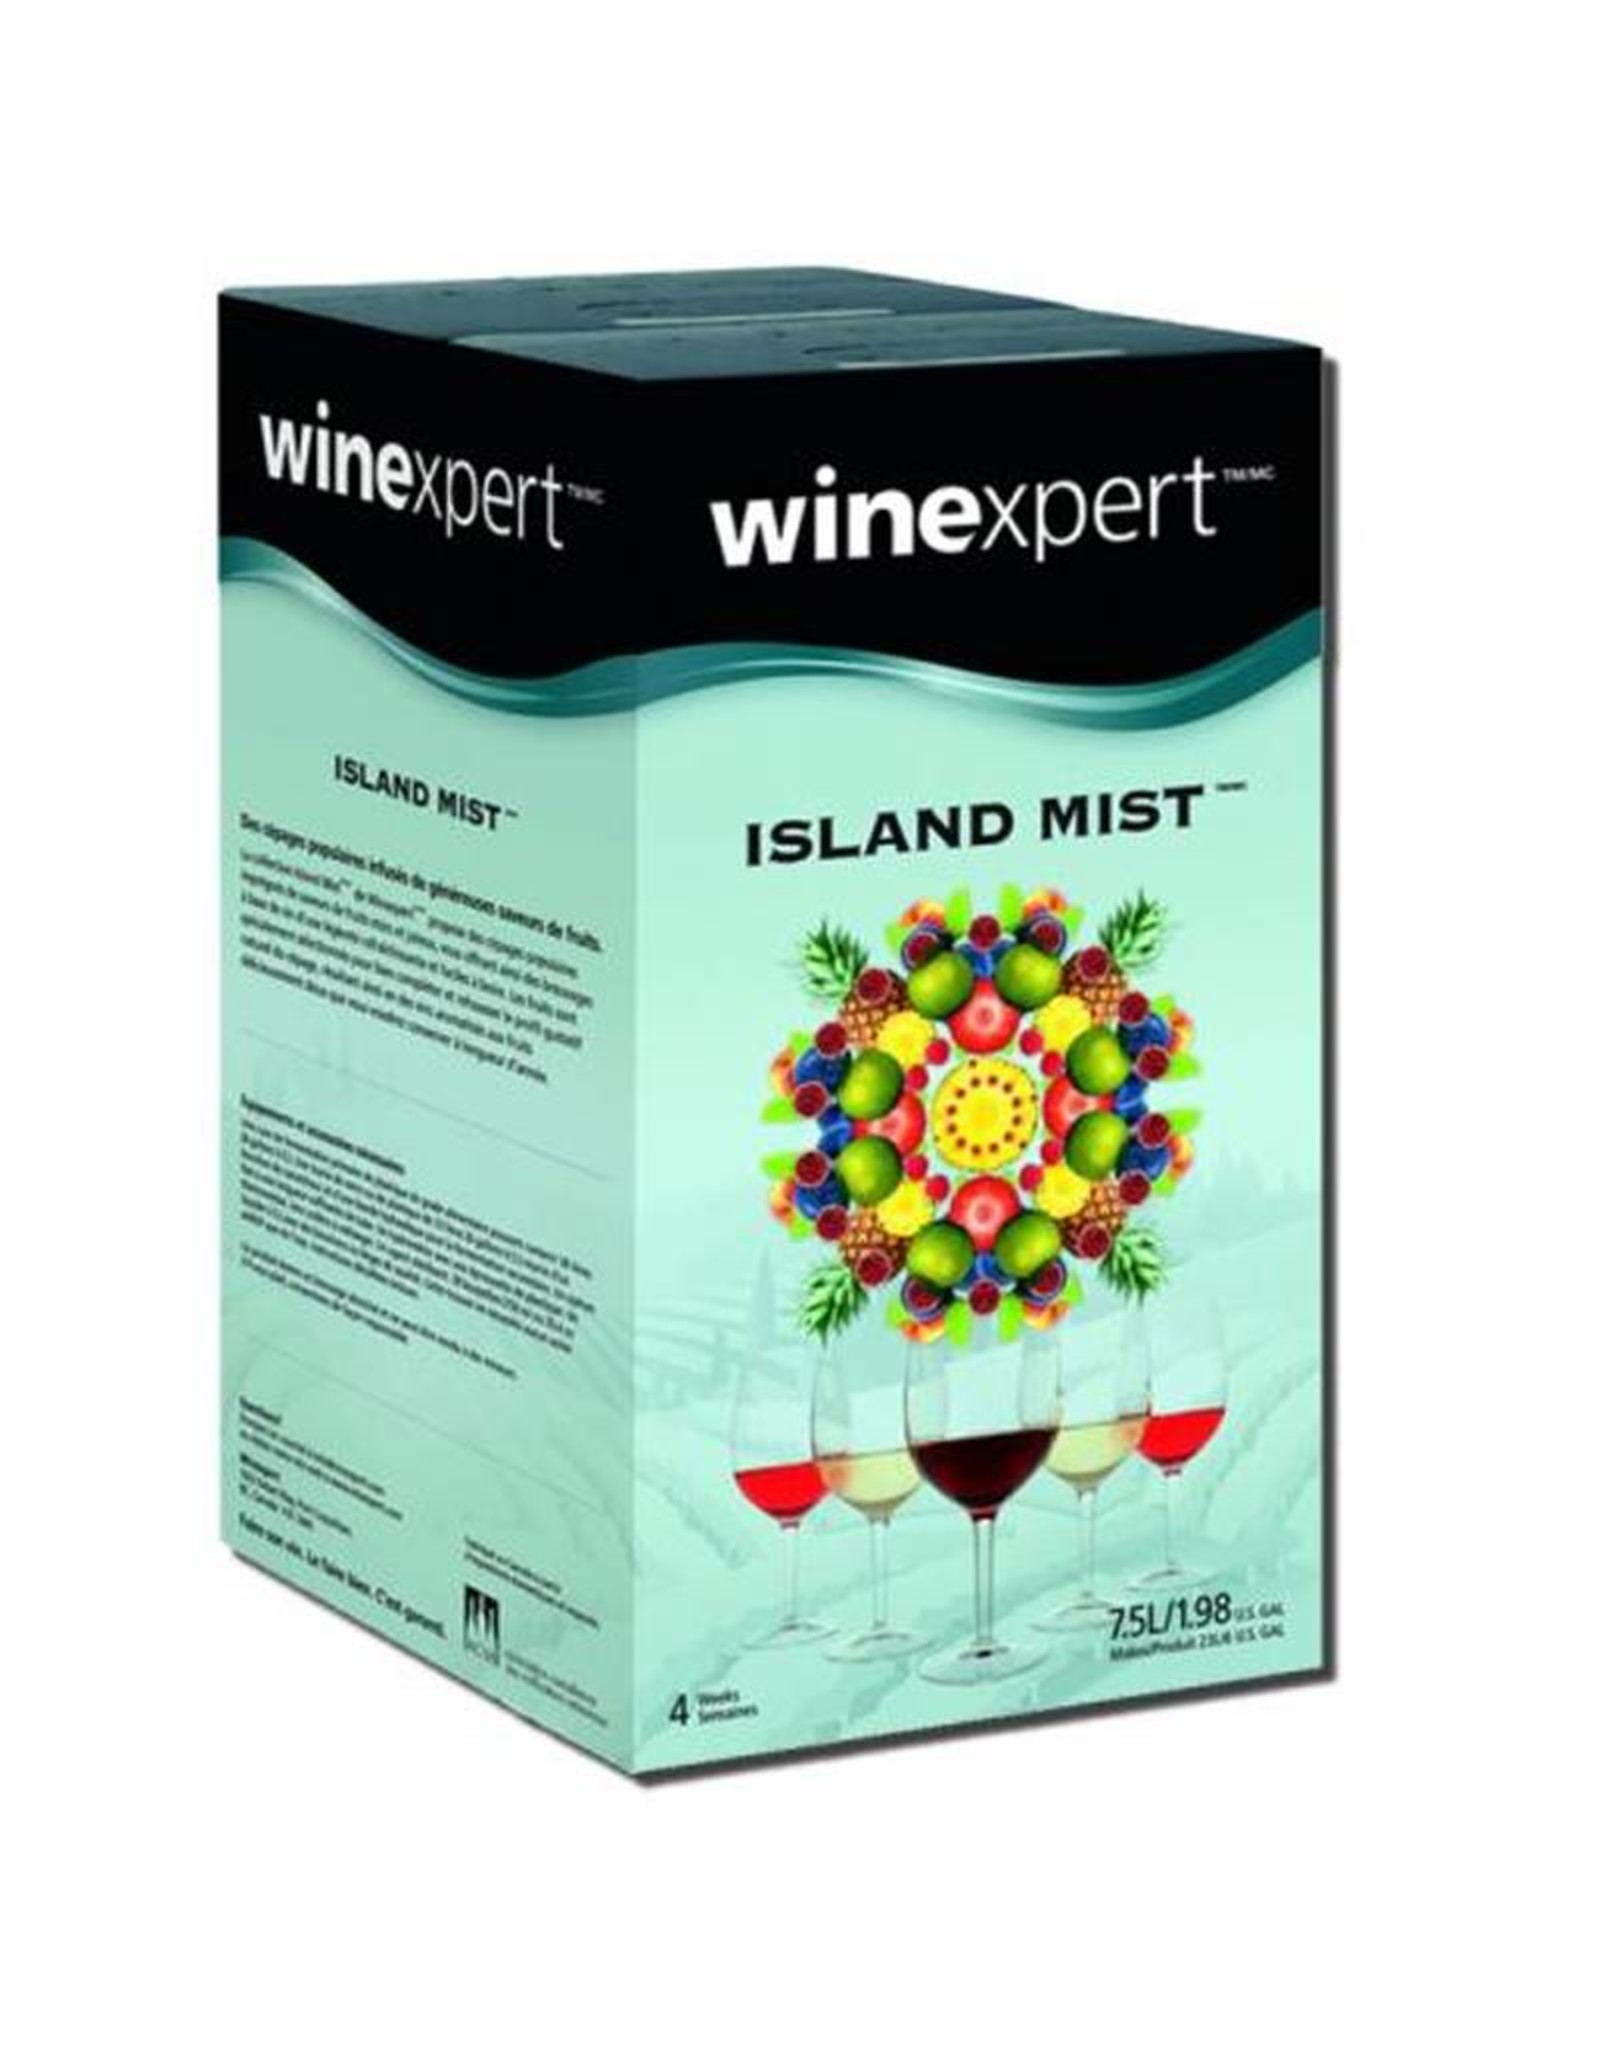 Island Mist Blackberry Cabernet 7.5L Kit